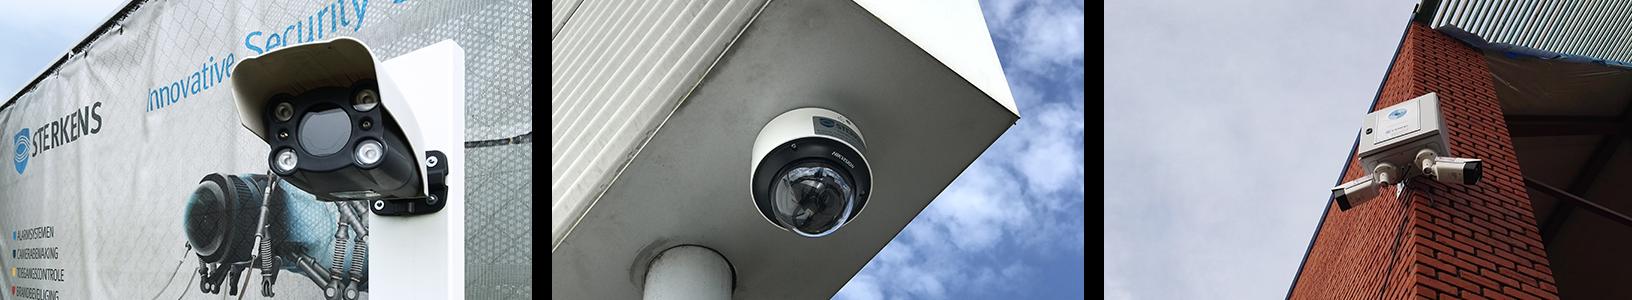 Camerabewaking-banner-algemeen.png